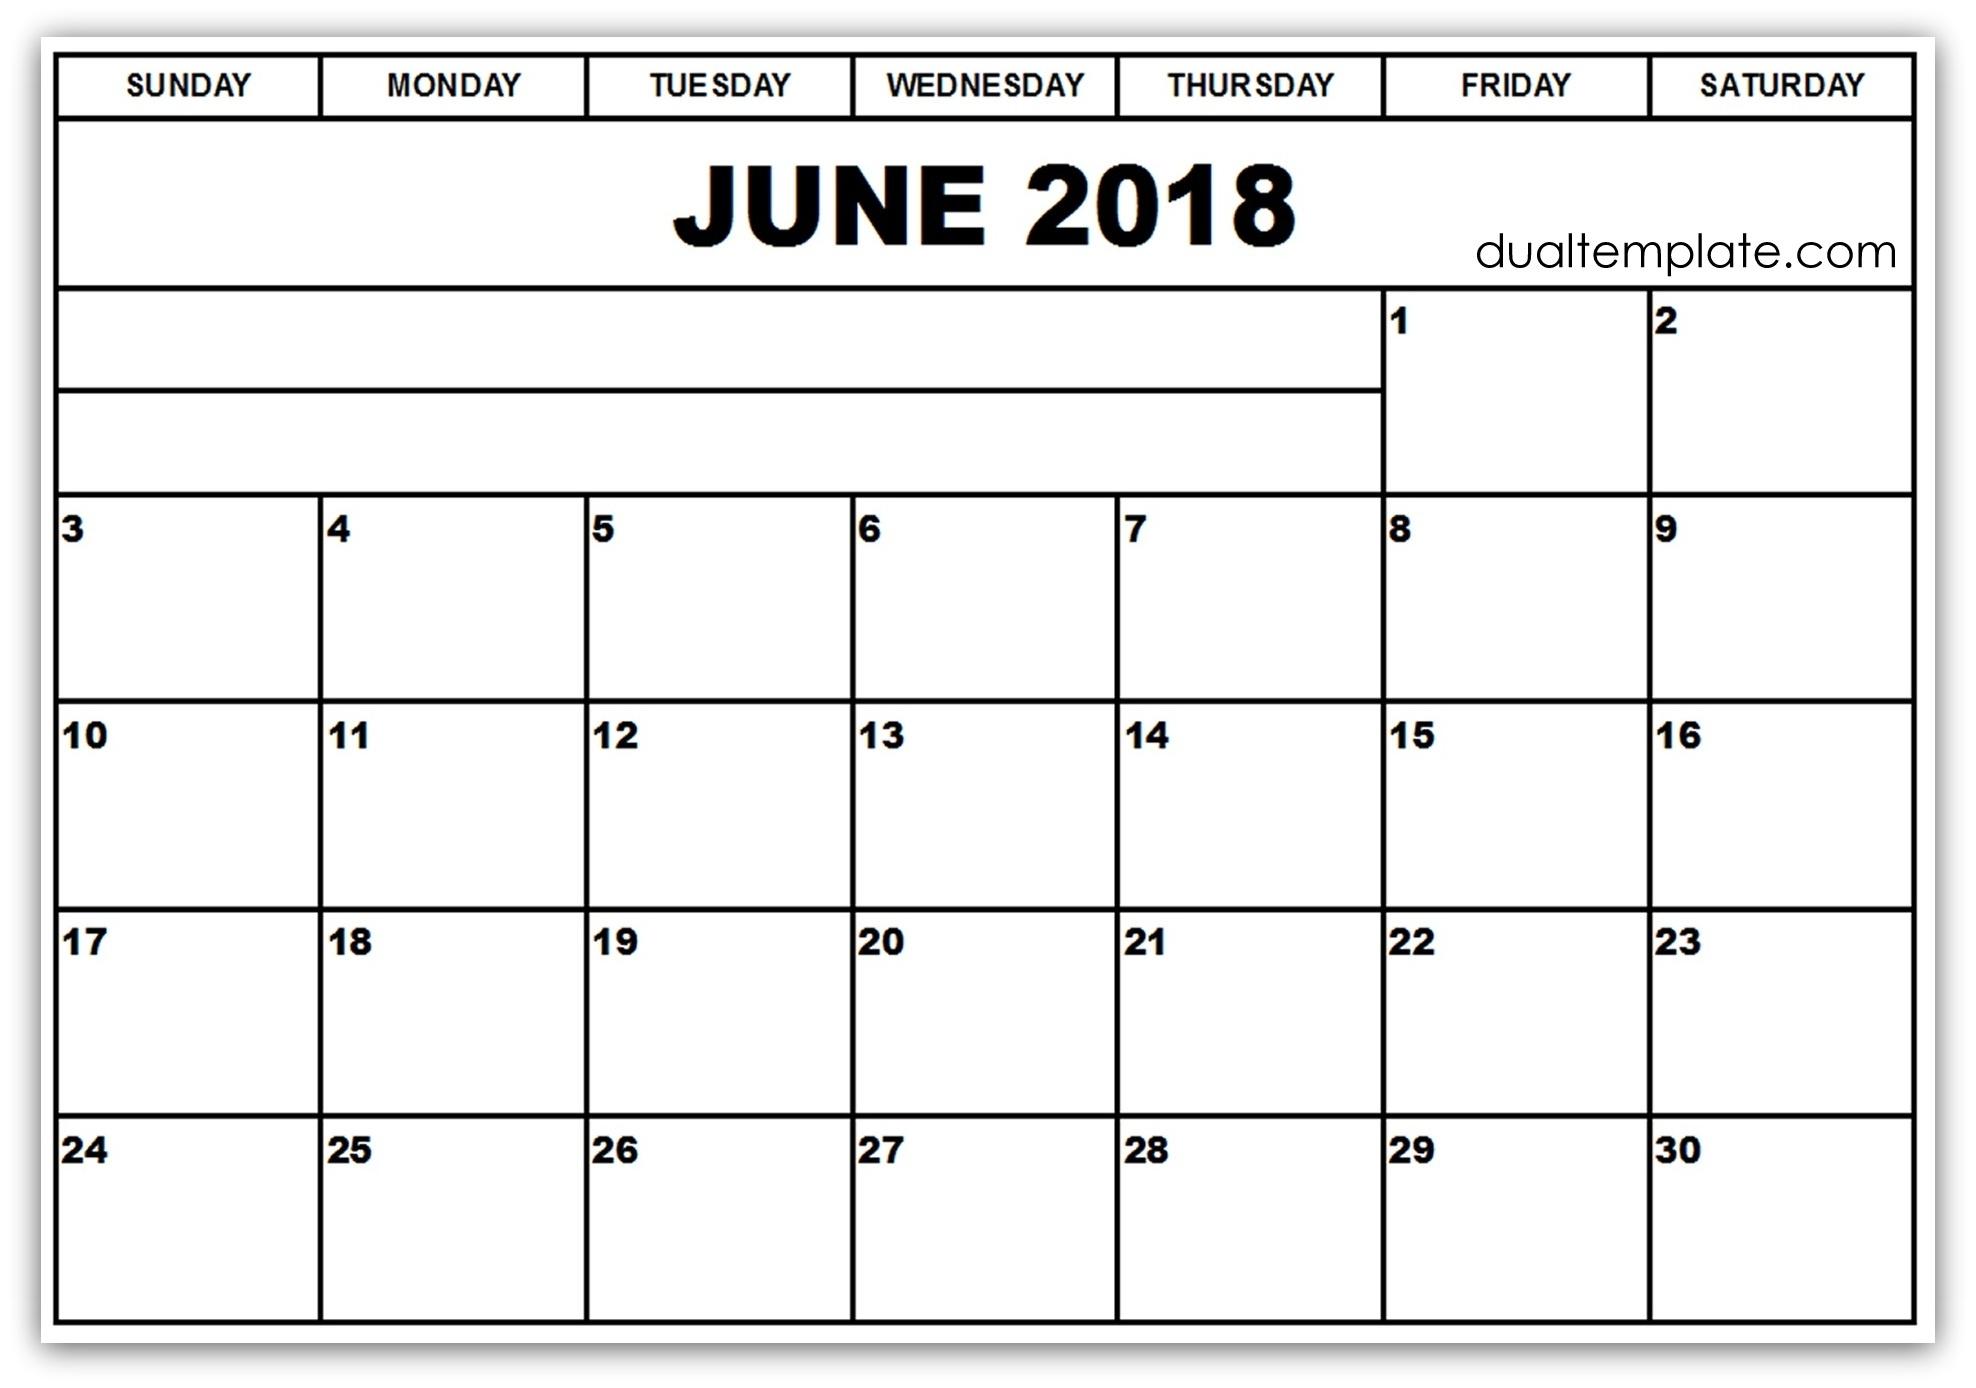 June Calendar 2018 With Holidays June 2018 Blank Calendar Printable  June And July Calendar Printable